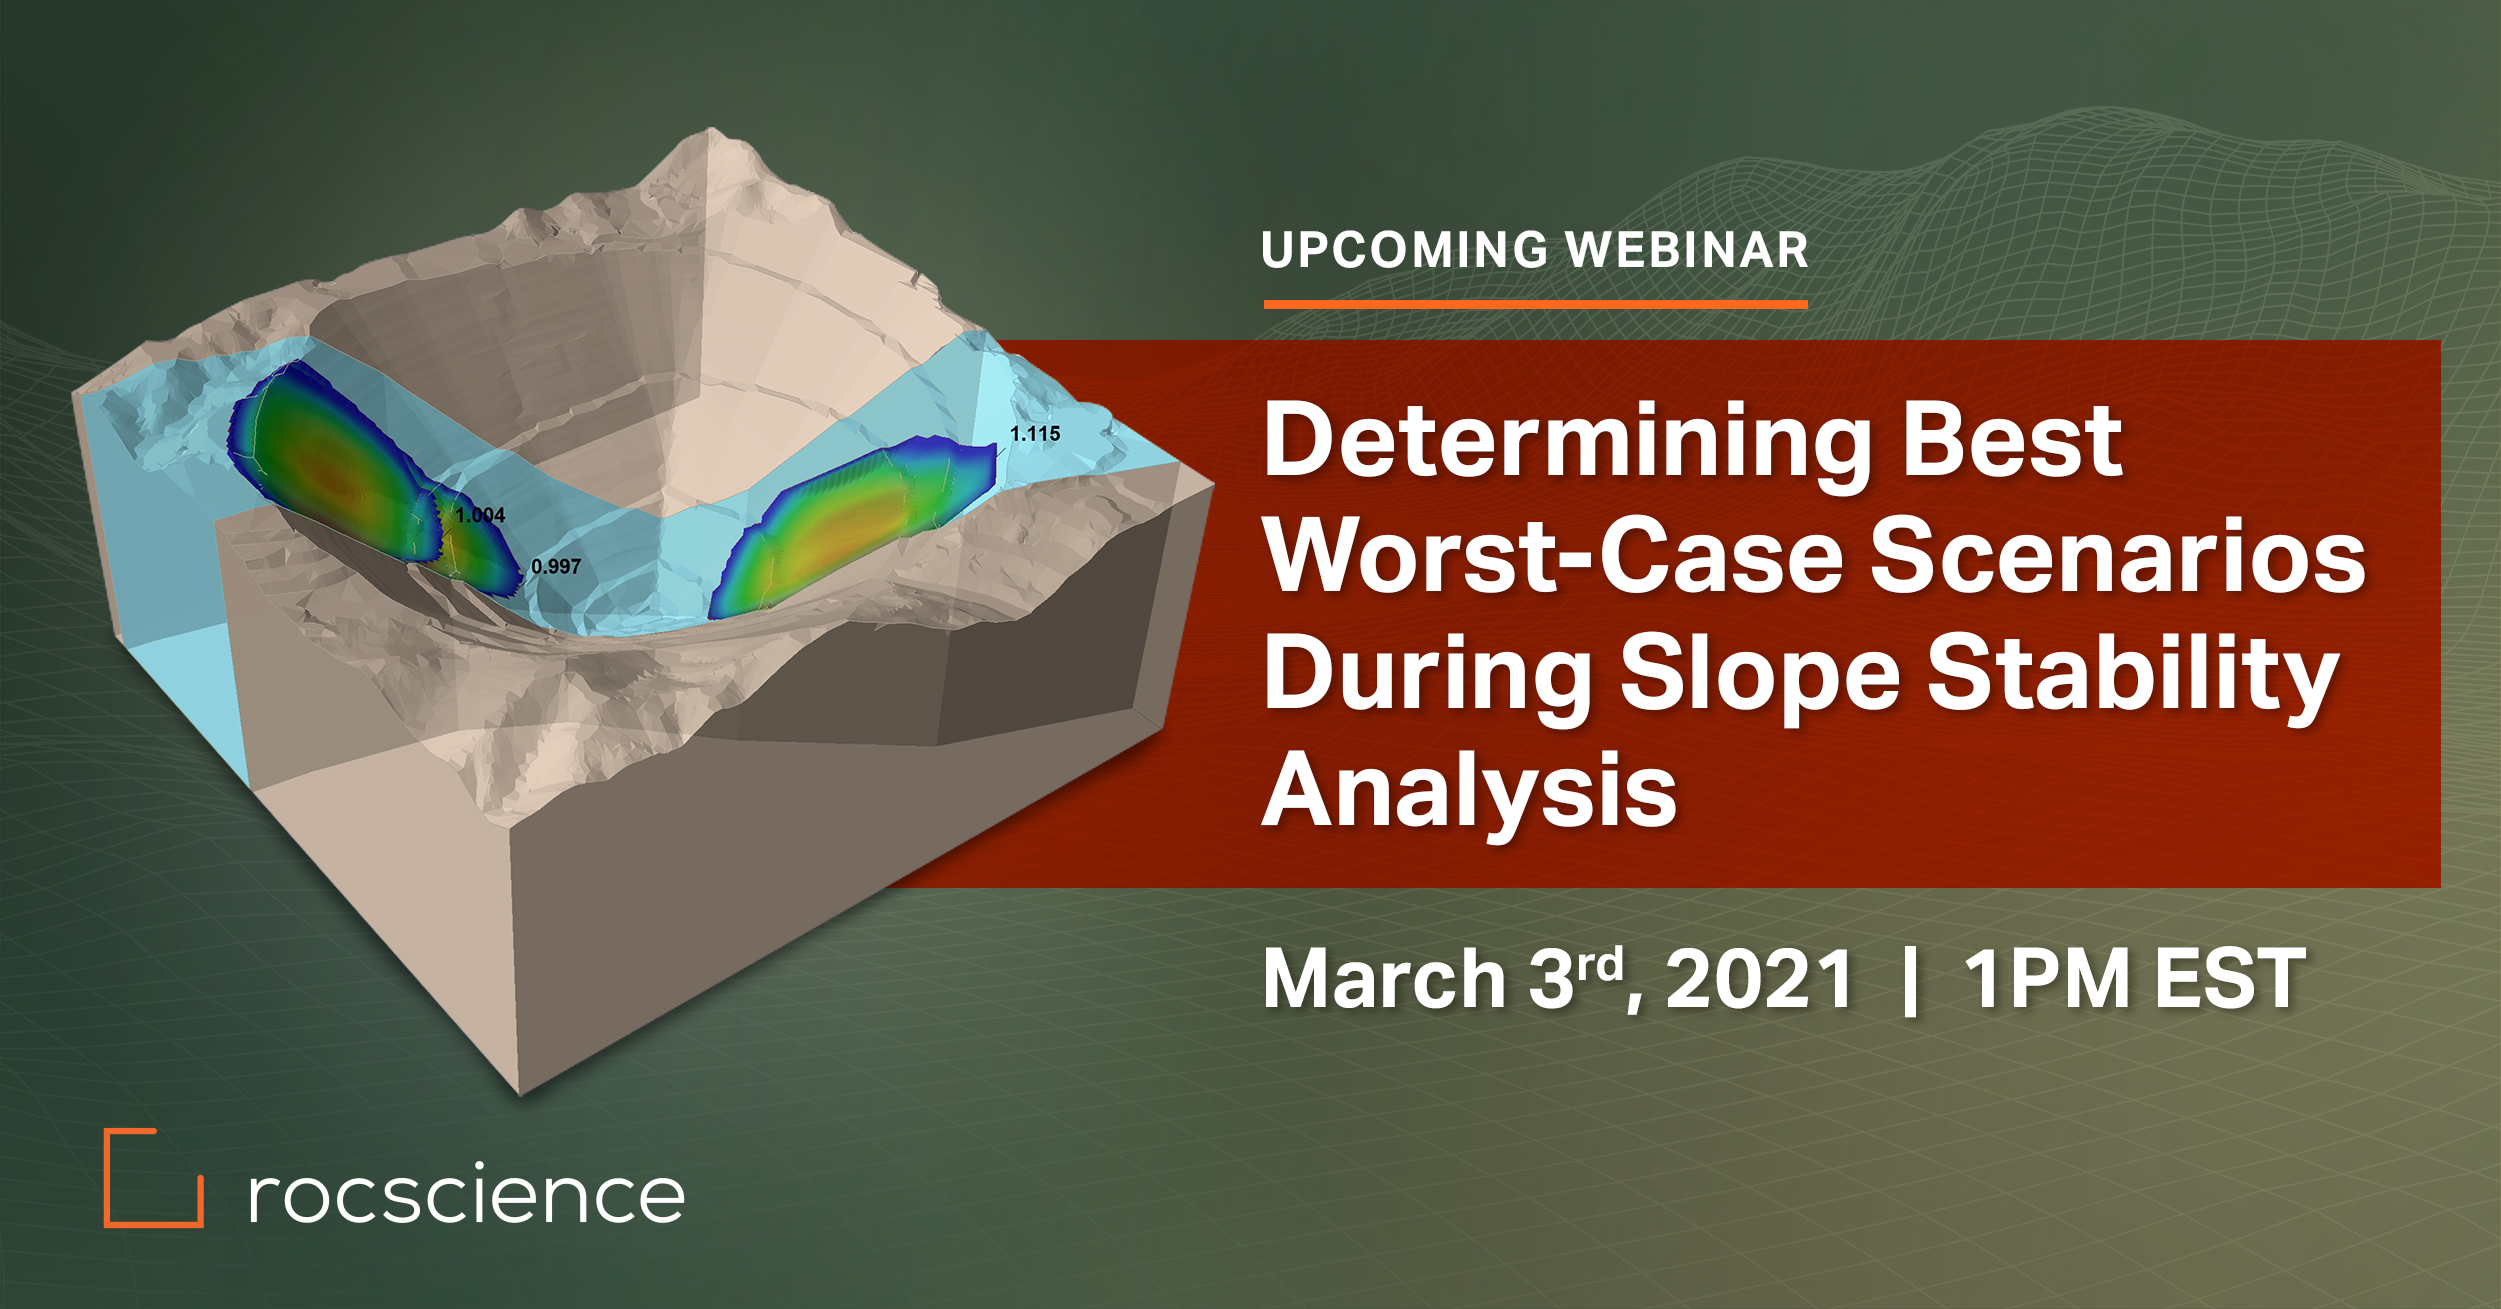 Rocscience Webinar: Determining Best Worst-Case Scenarios During Slope Stability Analysis